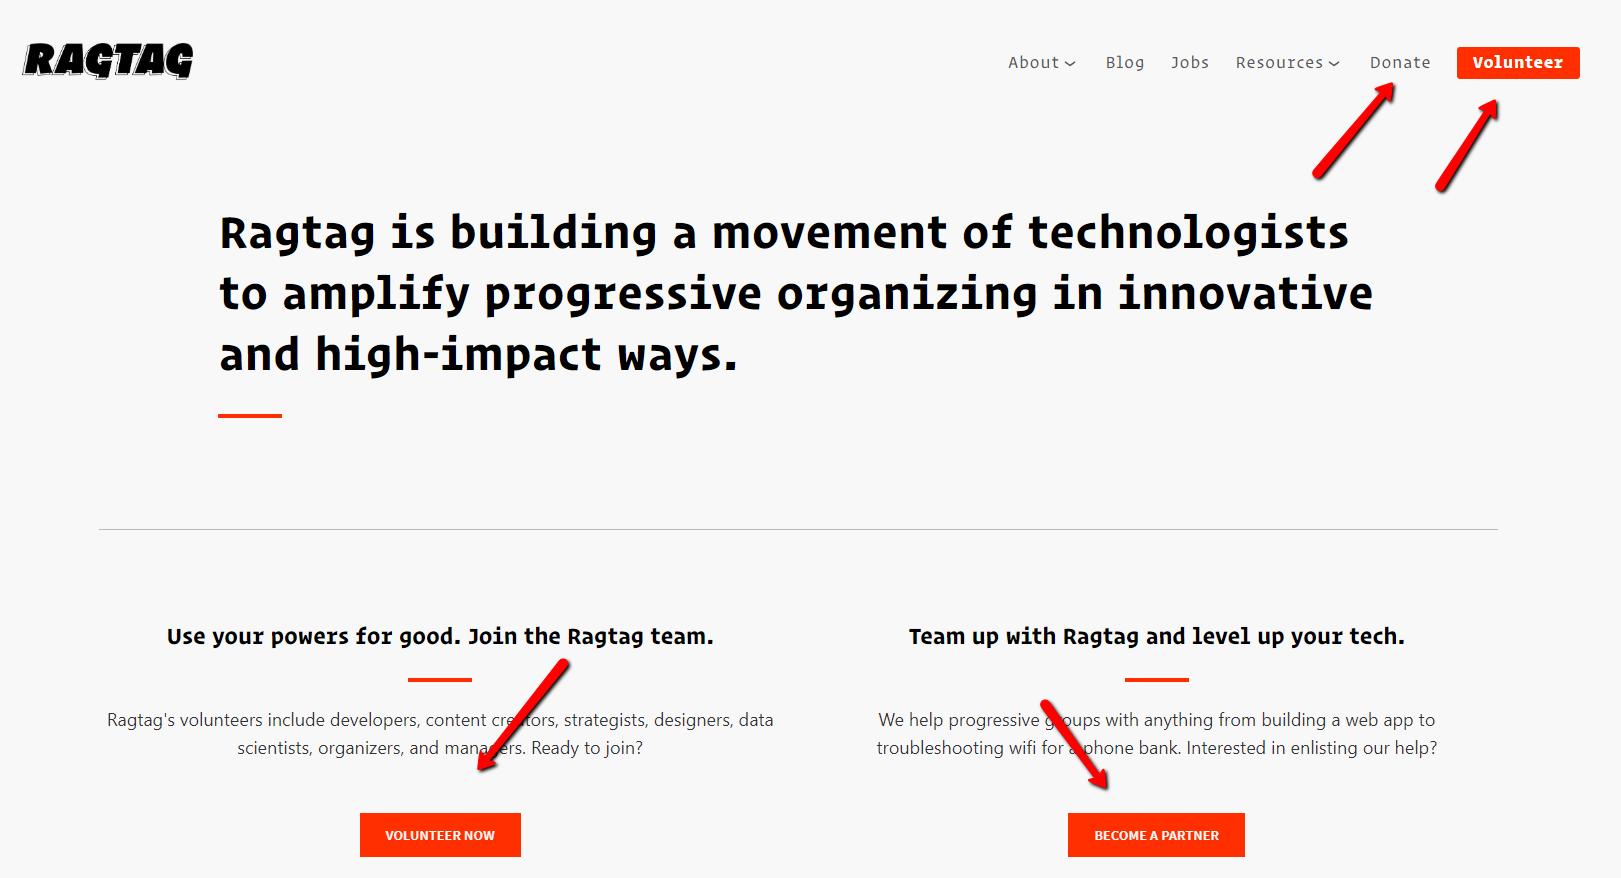 Ragtag's Website